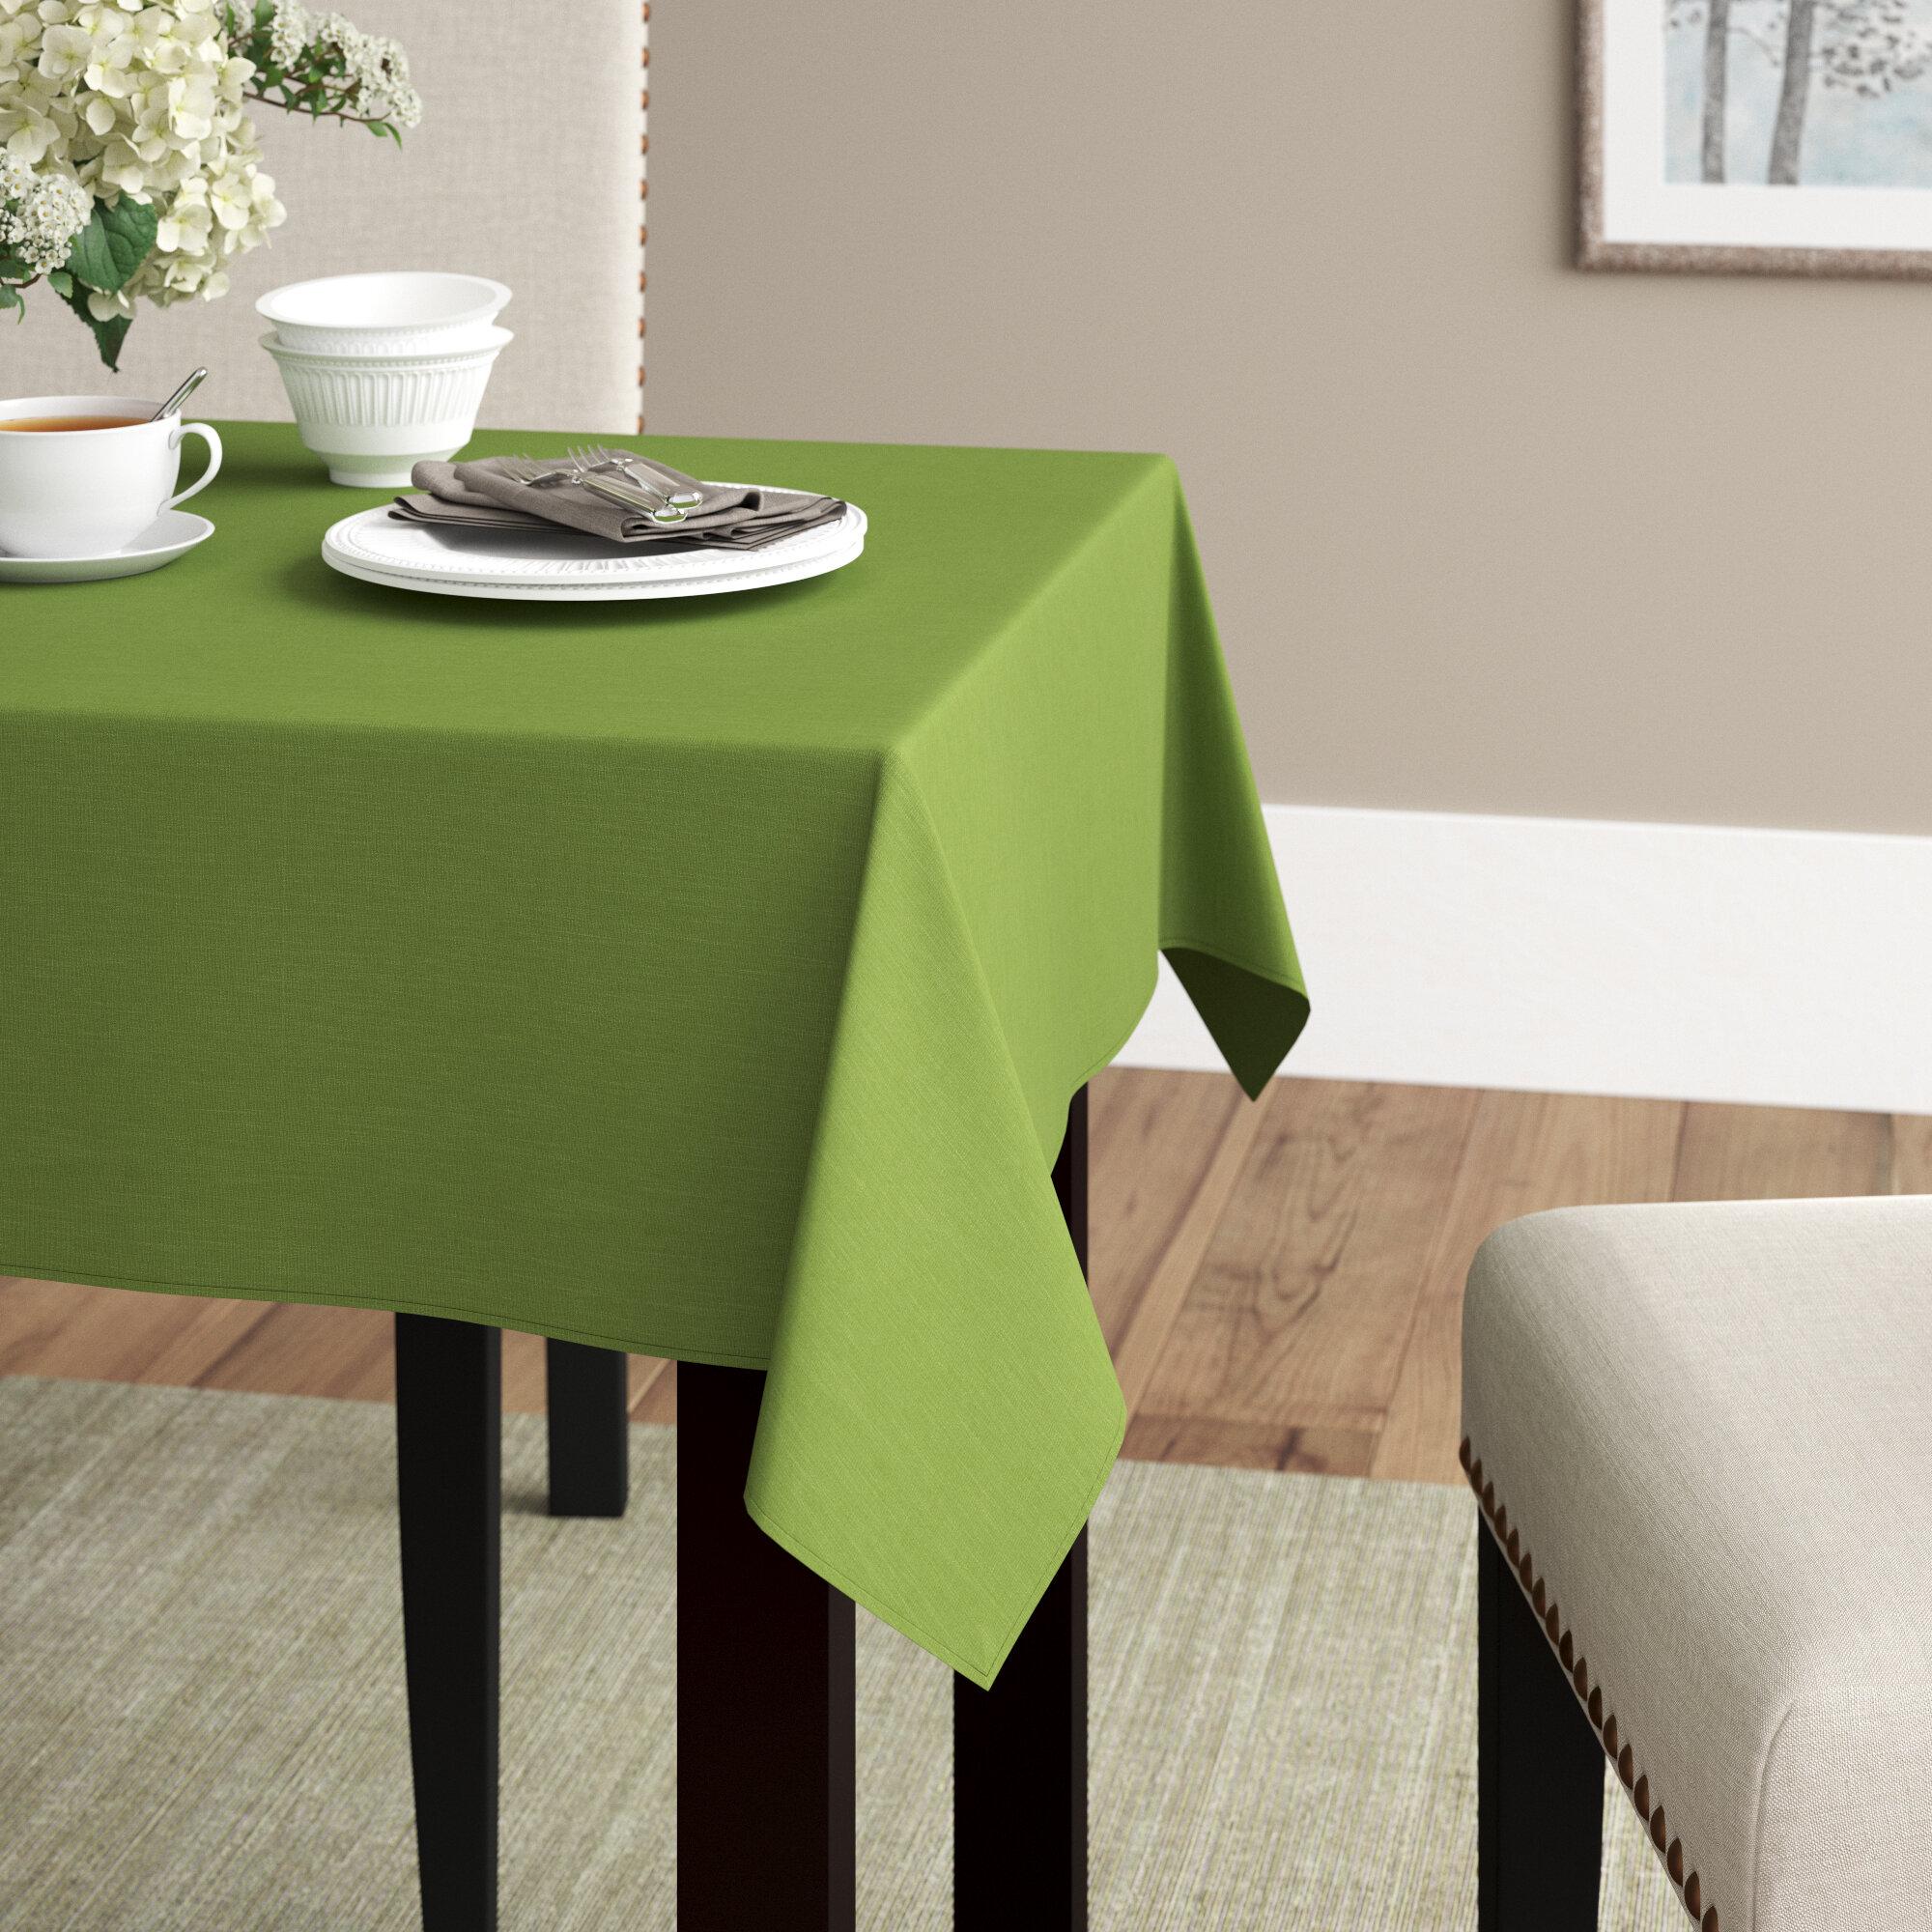 Green Winston Porter Tablecloths You Ll Love In 2021 Wayfair